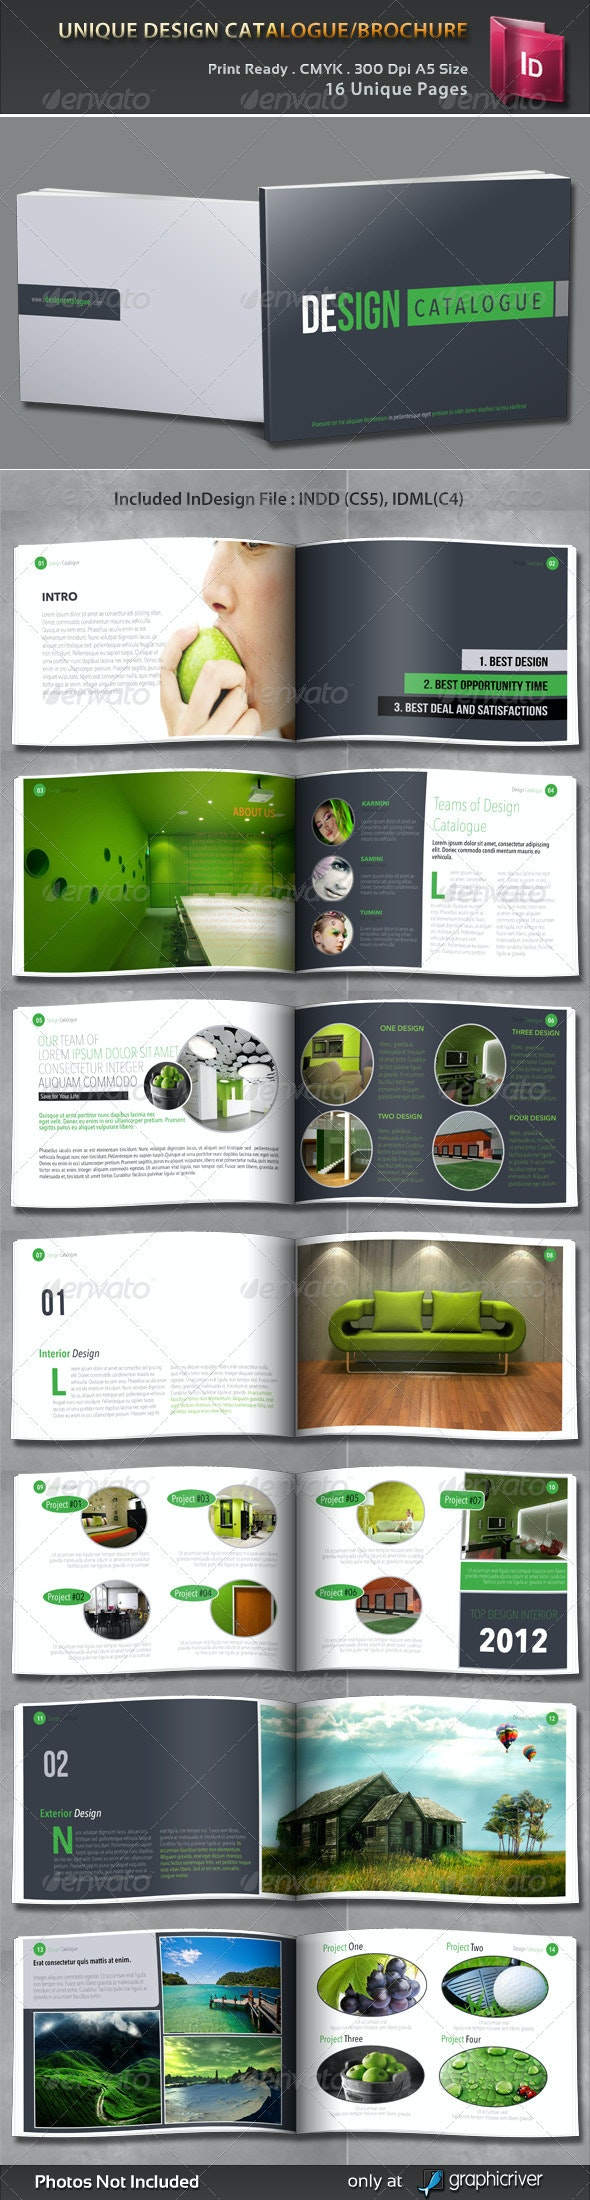 Unique Design Catalogue/Brochure - Corporate Brochures